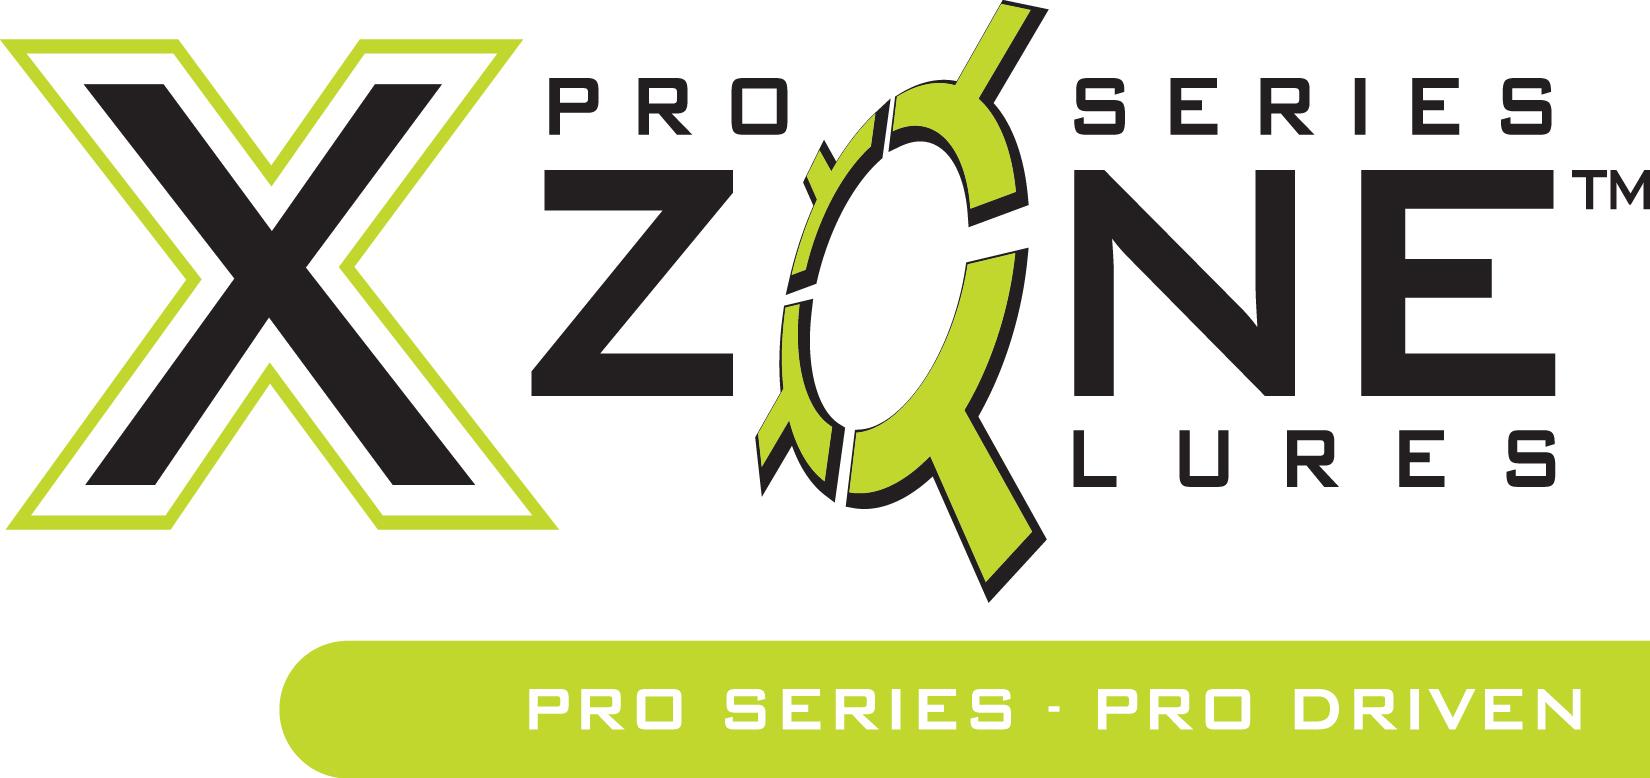 Xzone pro series 2  rgb